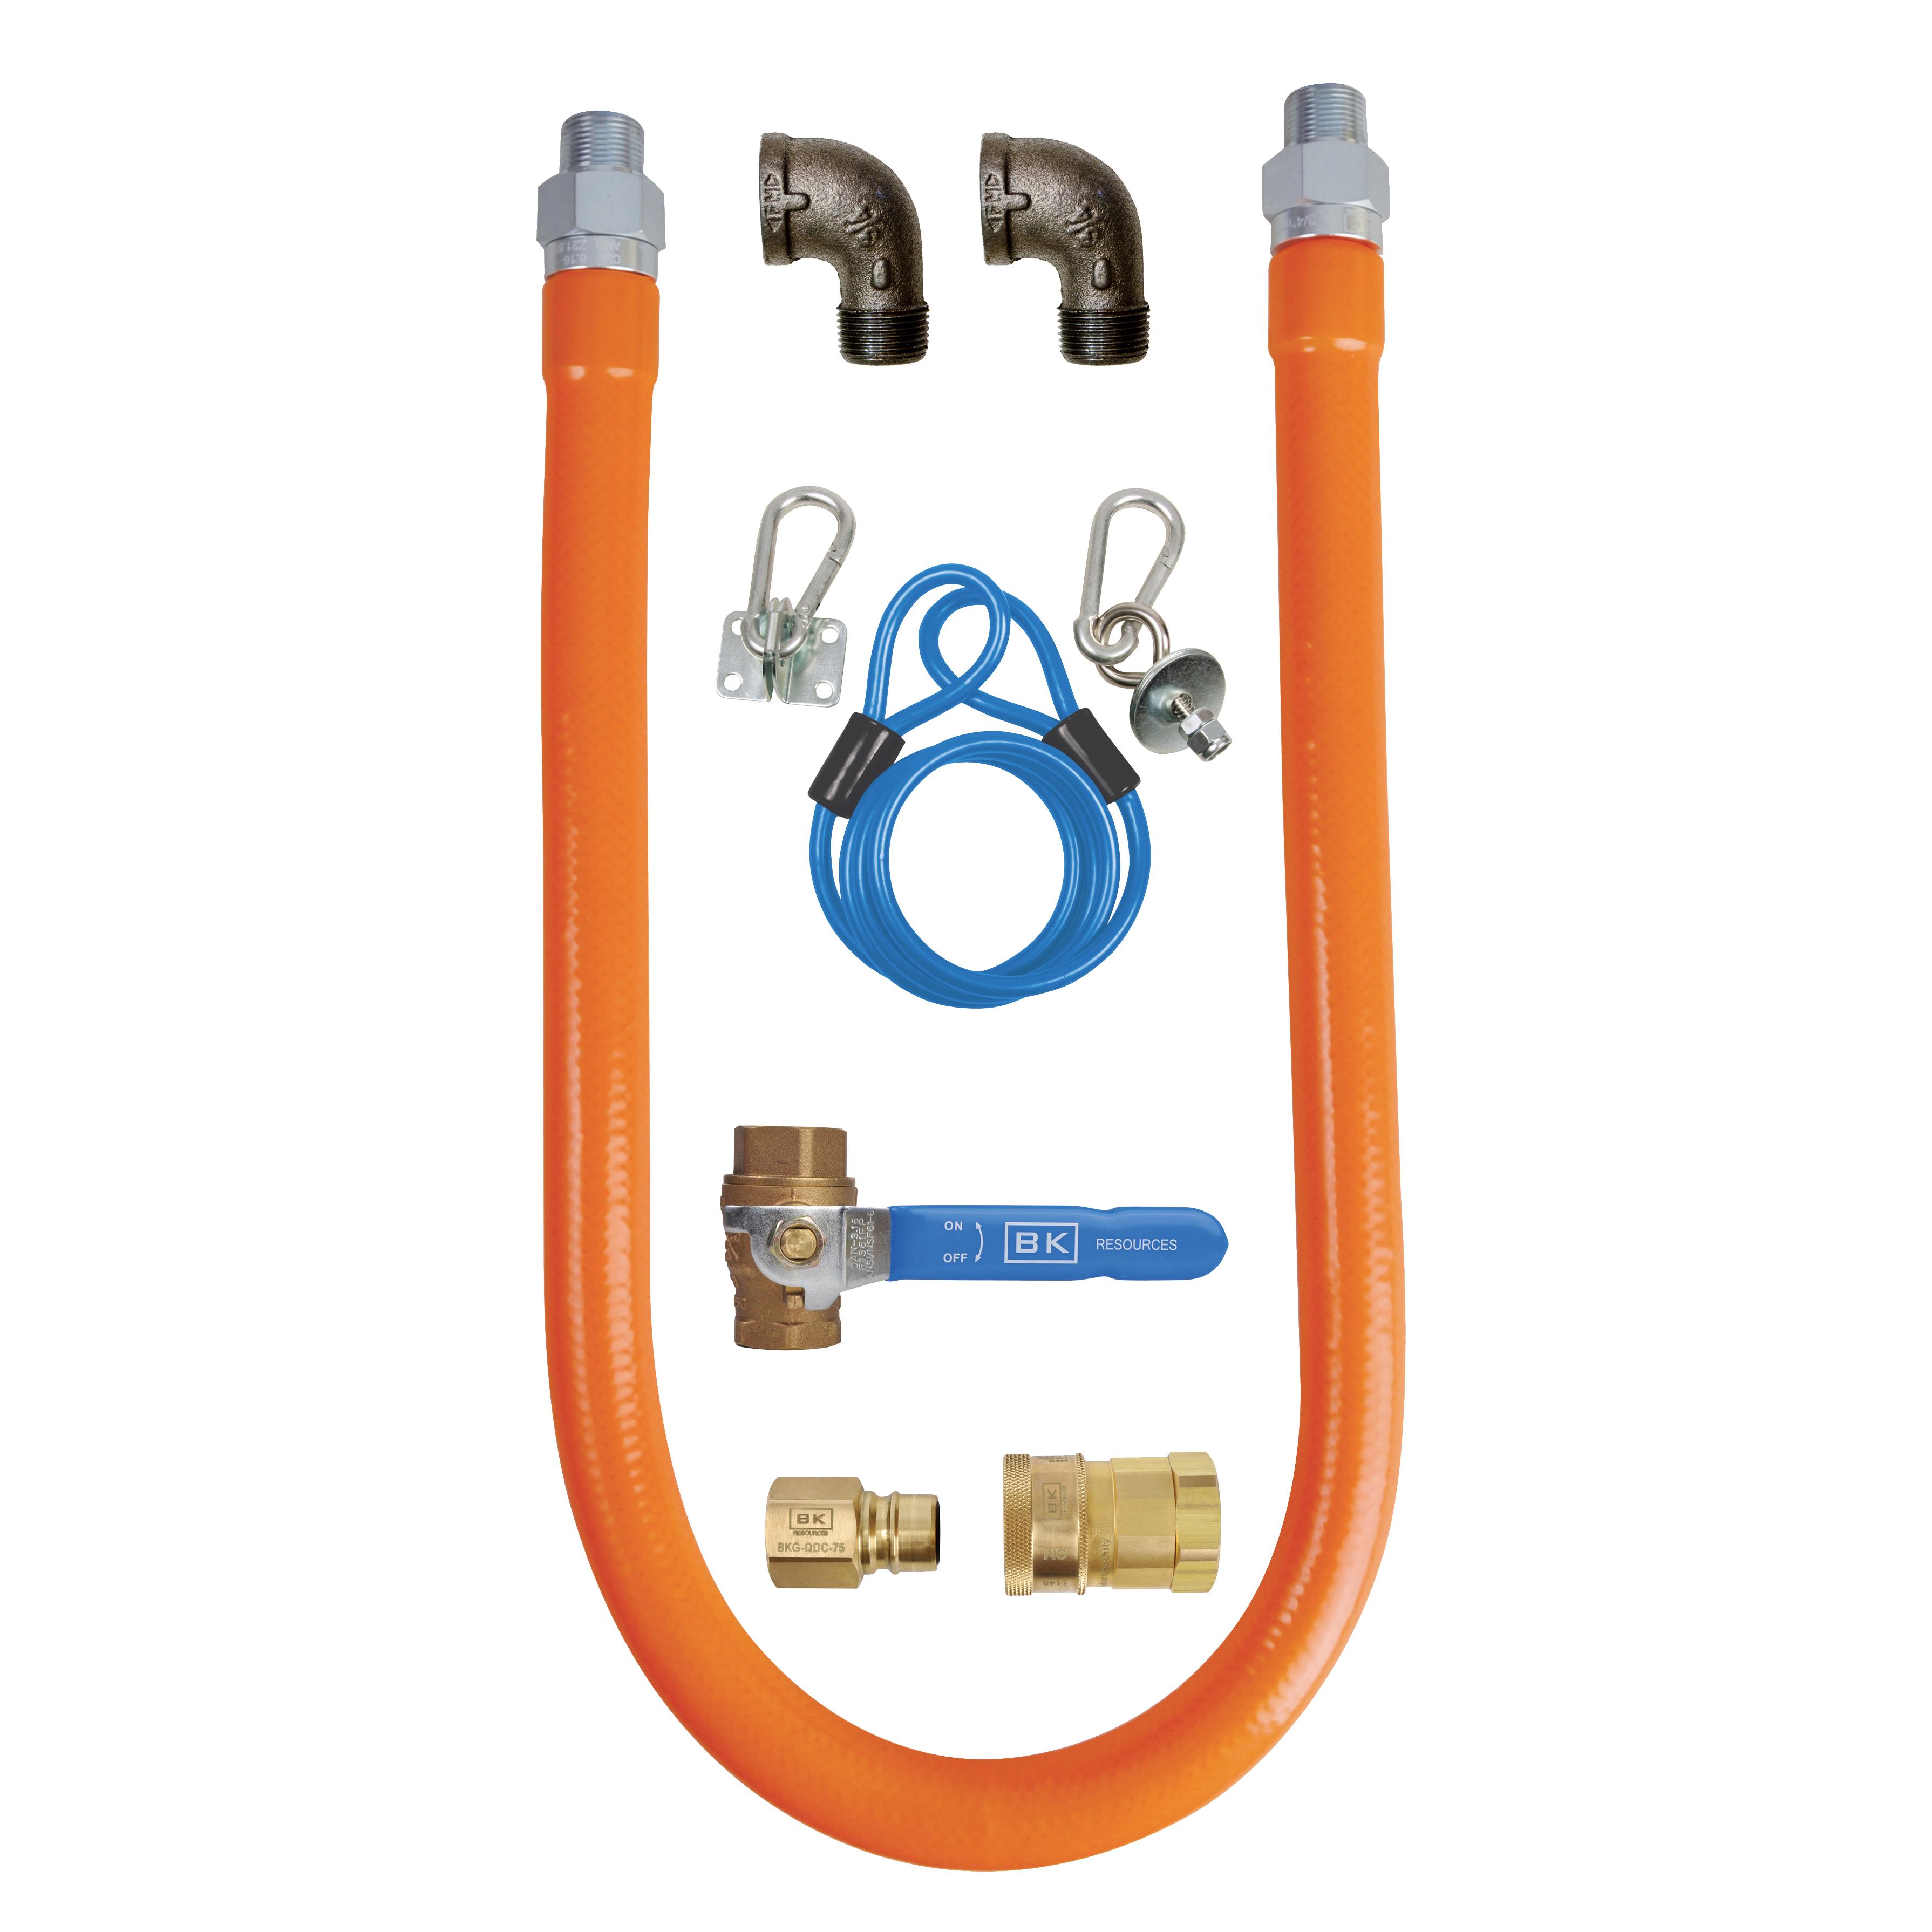 BK Resources BKG-GHC-5060-SCK3 gas connector hose kit